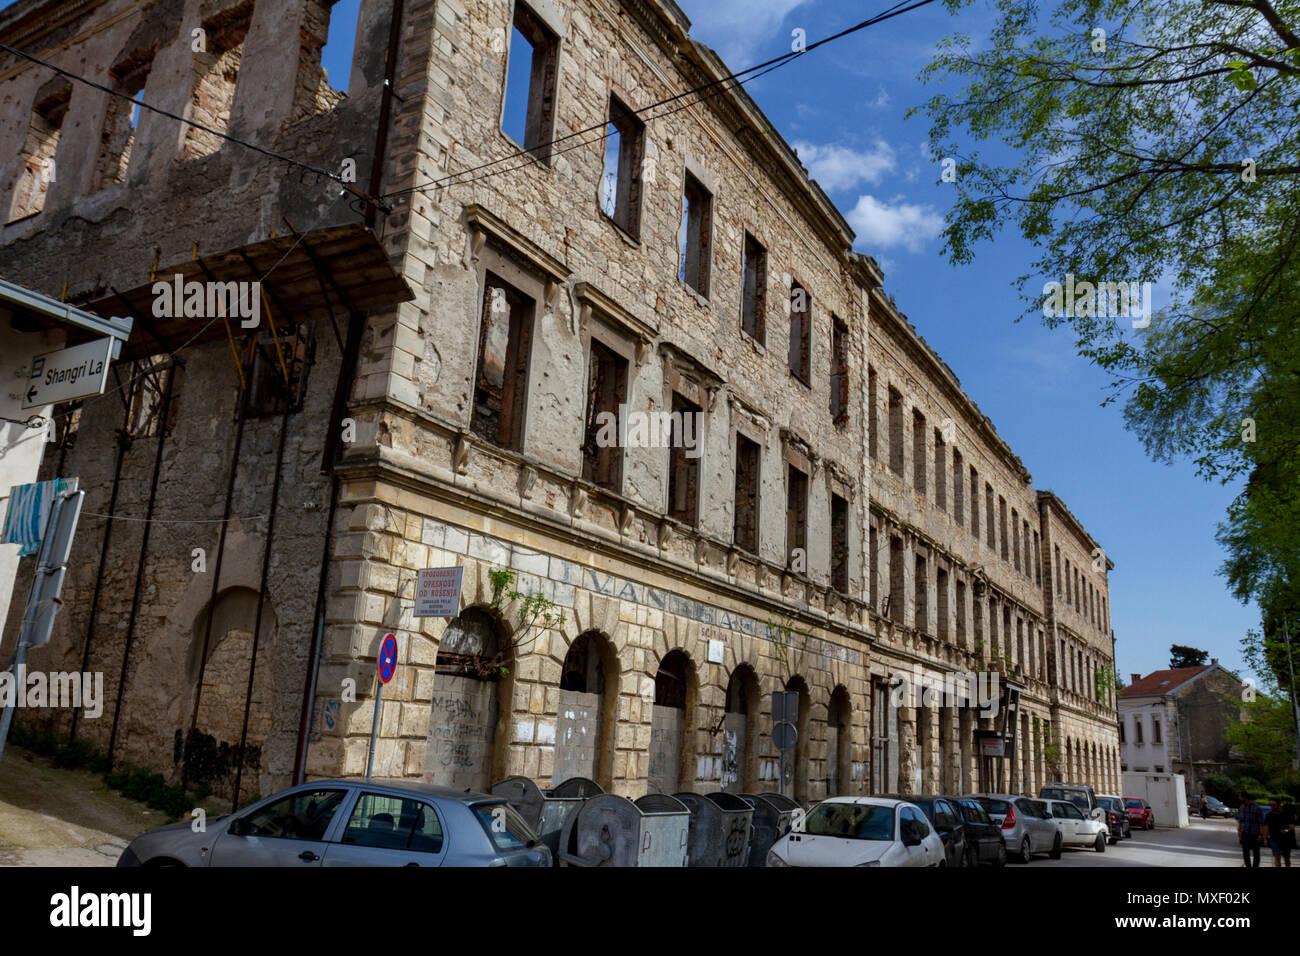 A Bosnian War (Homeland War) damaged building in Mostar, the Federation of Bosnia and Herzegovina. - Stock Image